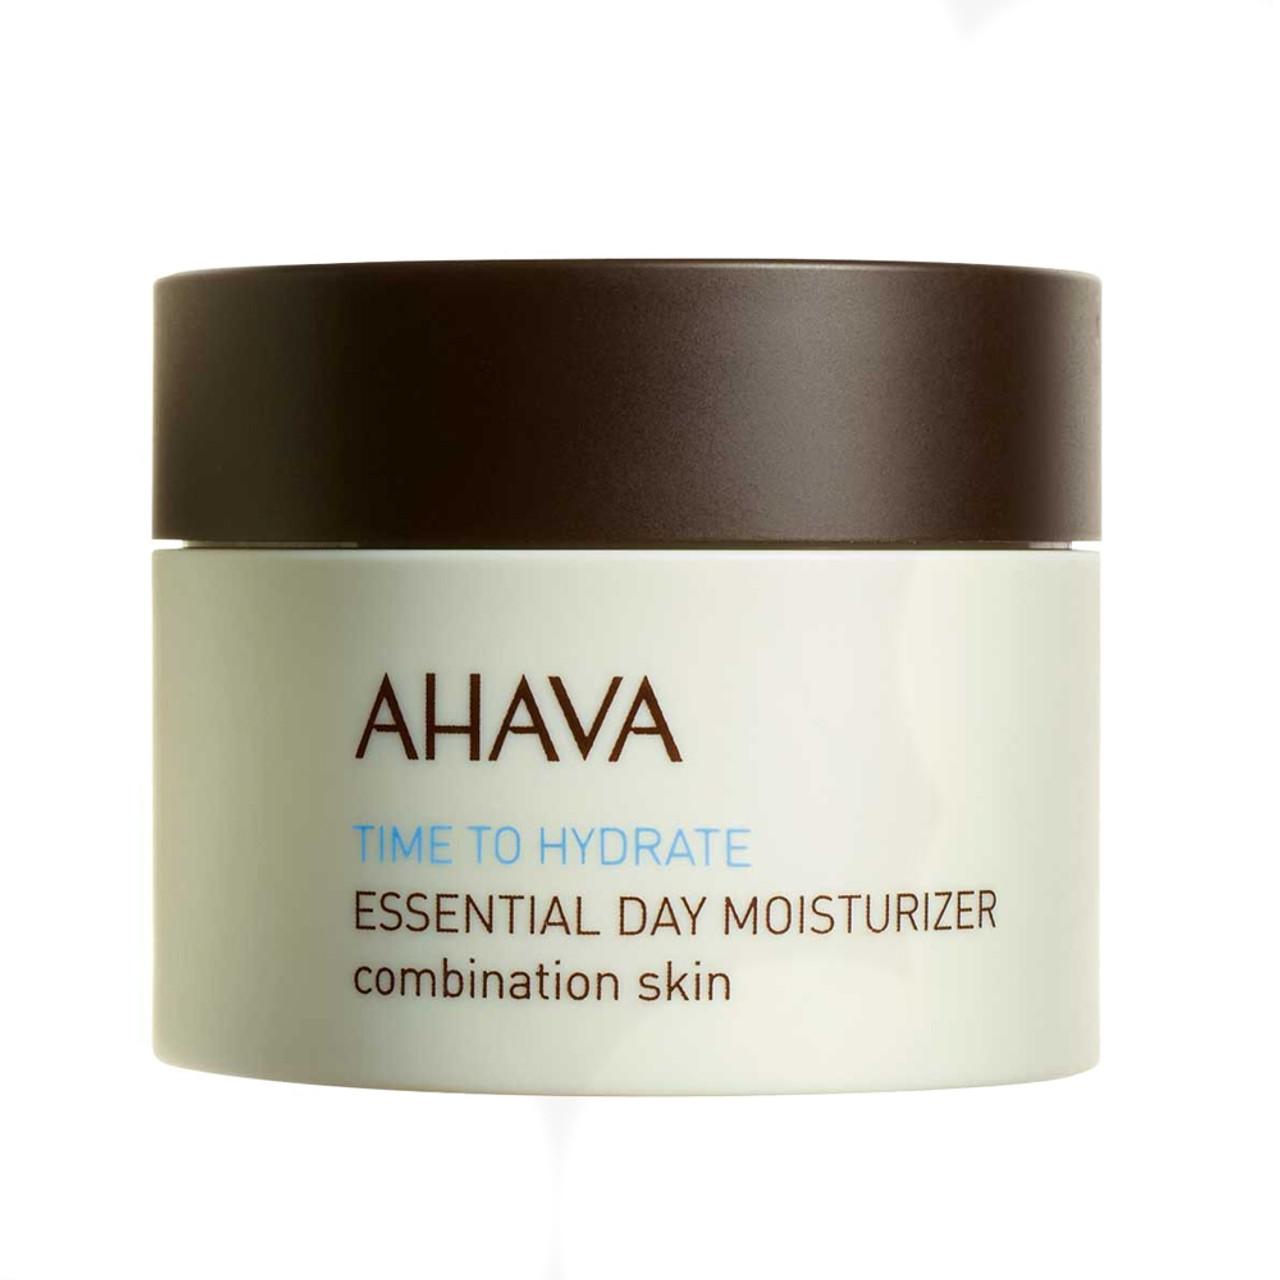 AHAVA Essential Day Moisture Combination